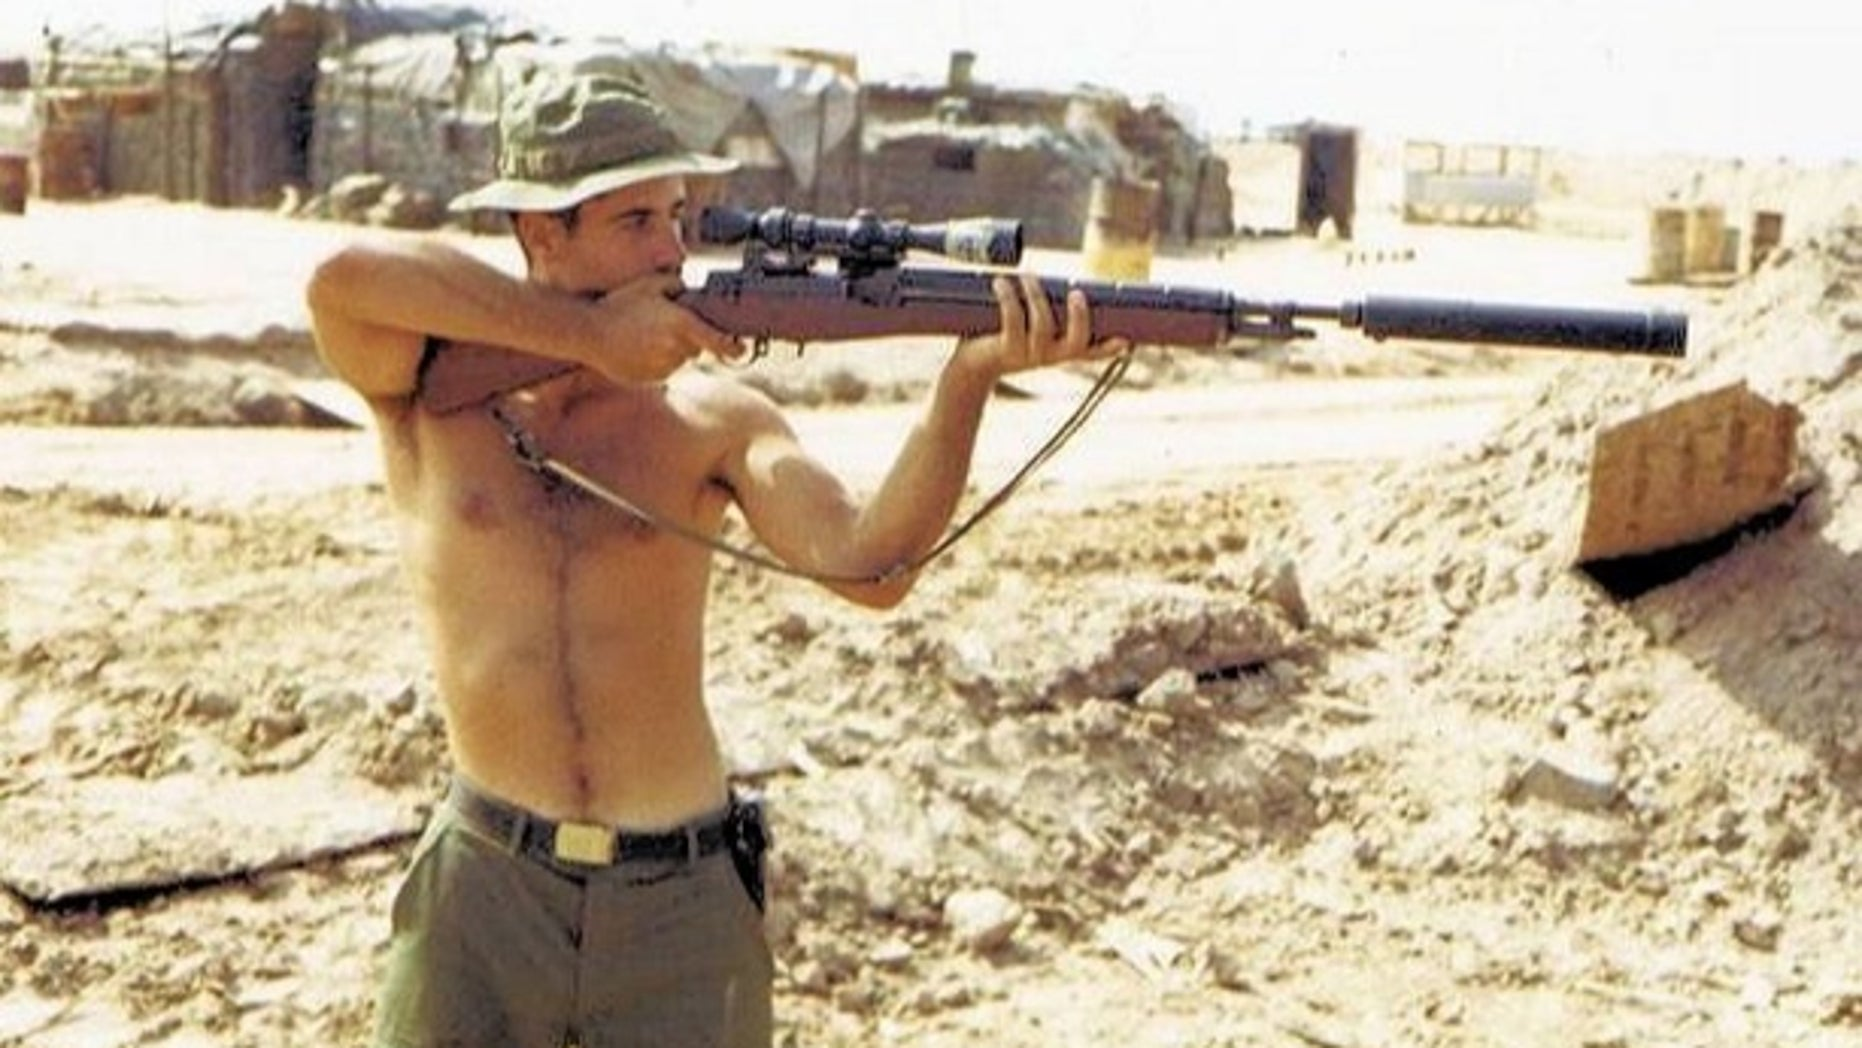 Gunnery Sgt. Carlos Hathcock. (US Marine Corps Archives)